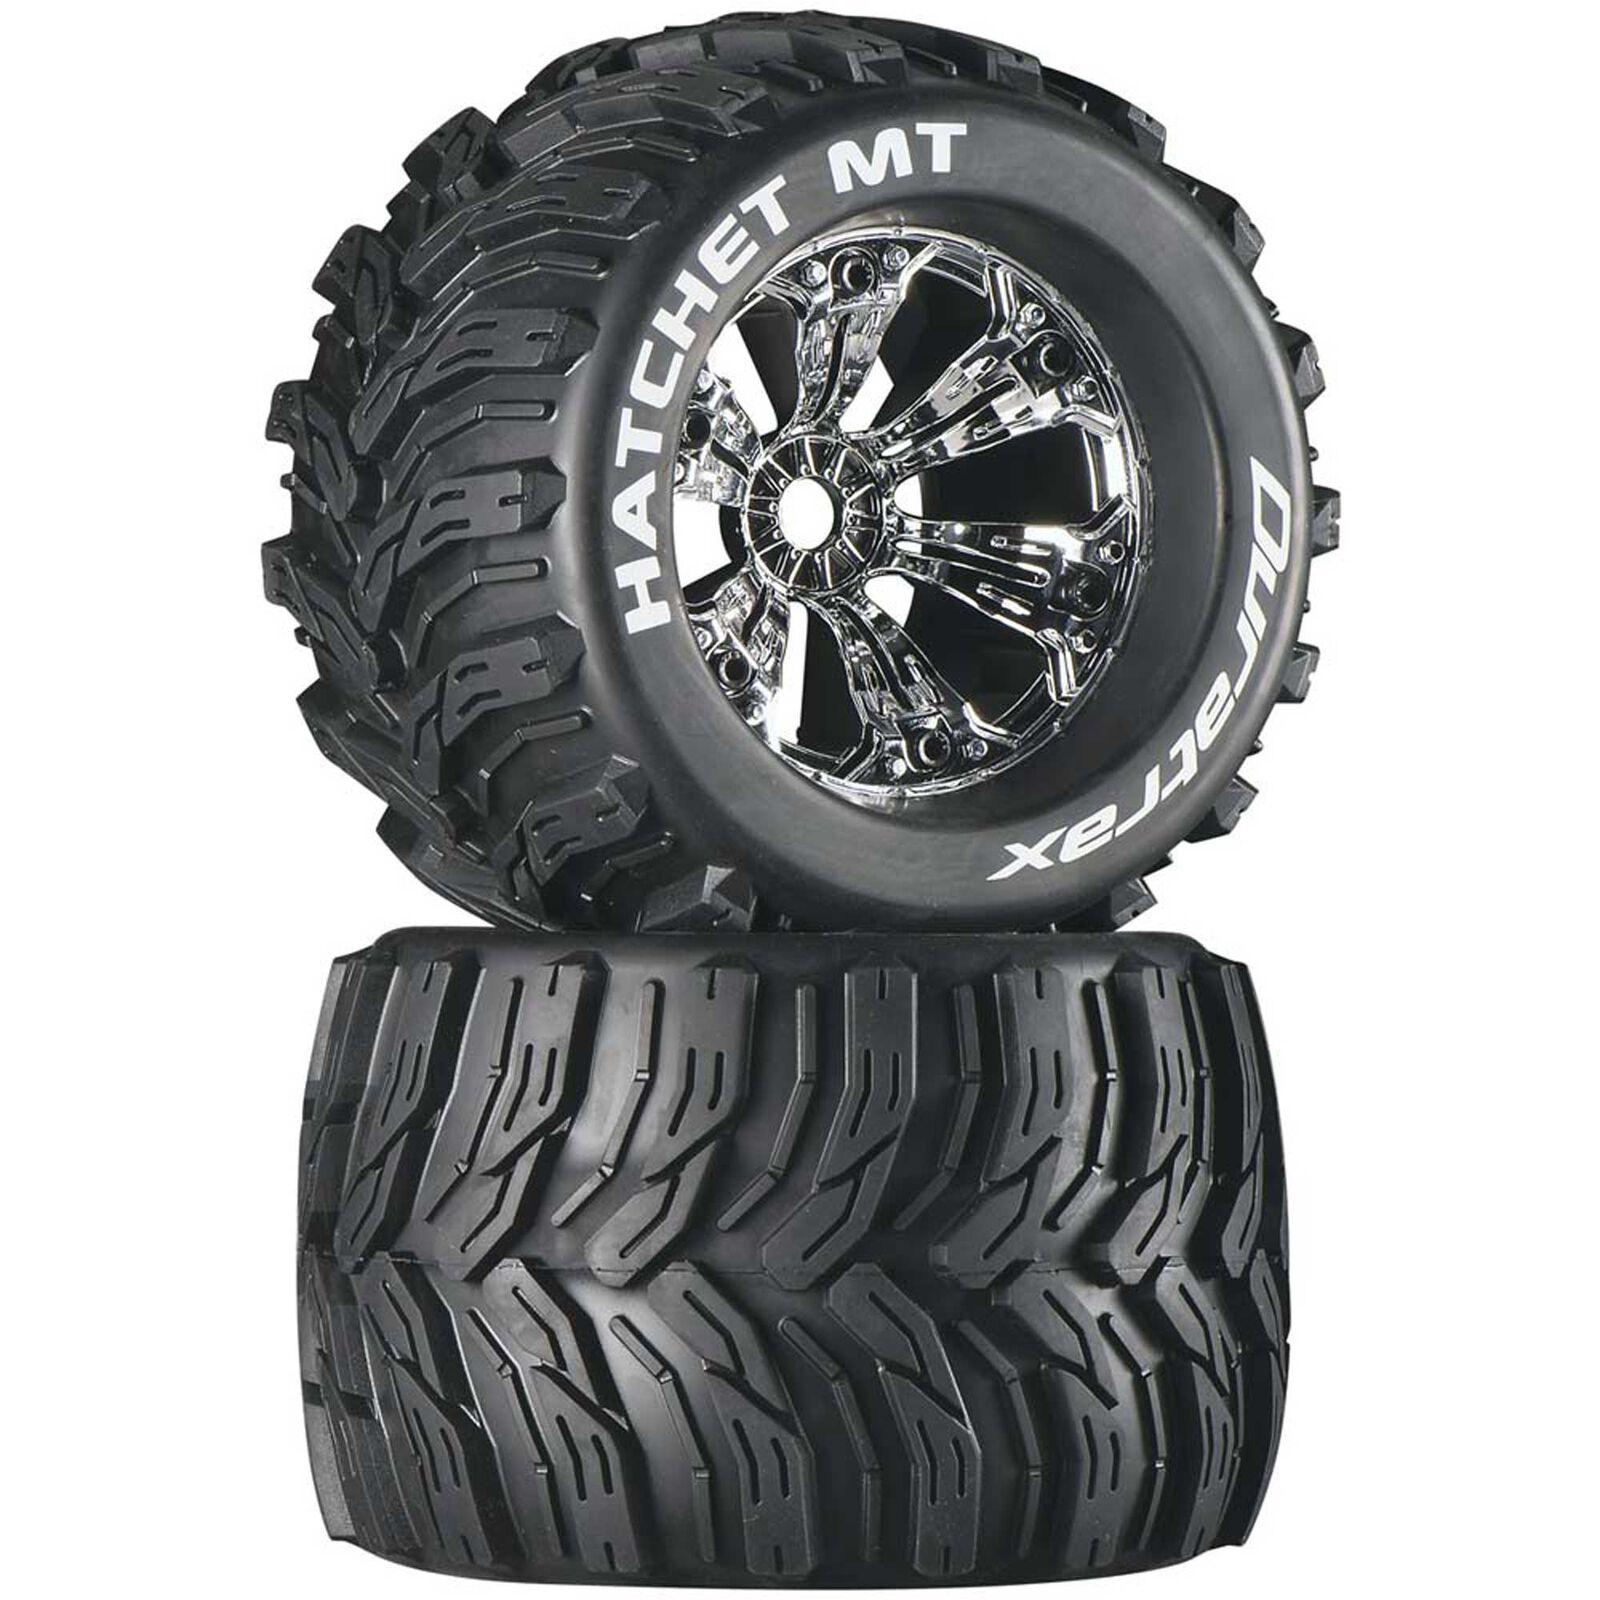 "Hatchet MT 3.8"" Mounted 1/2"" Offset  Tires, Chrome (2)"